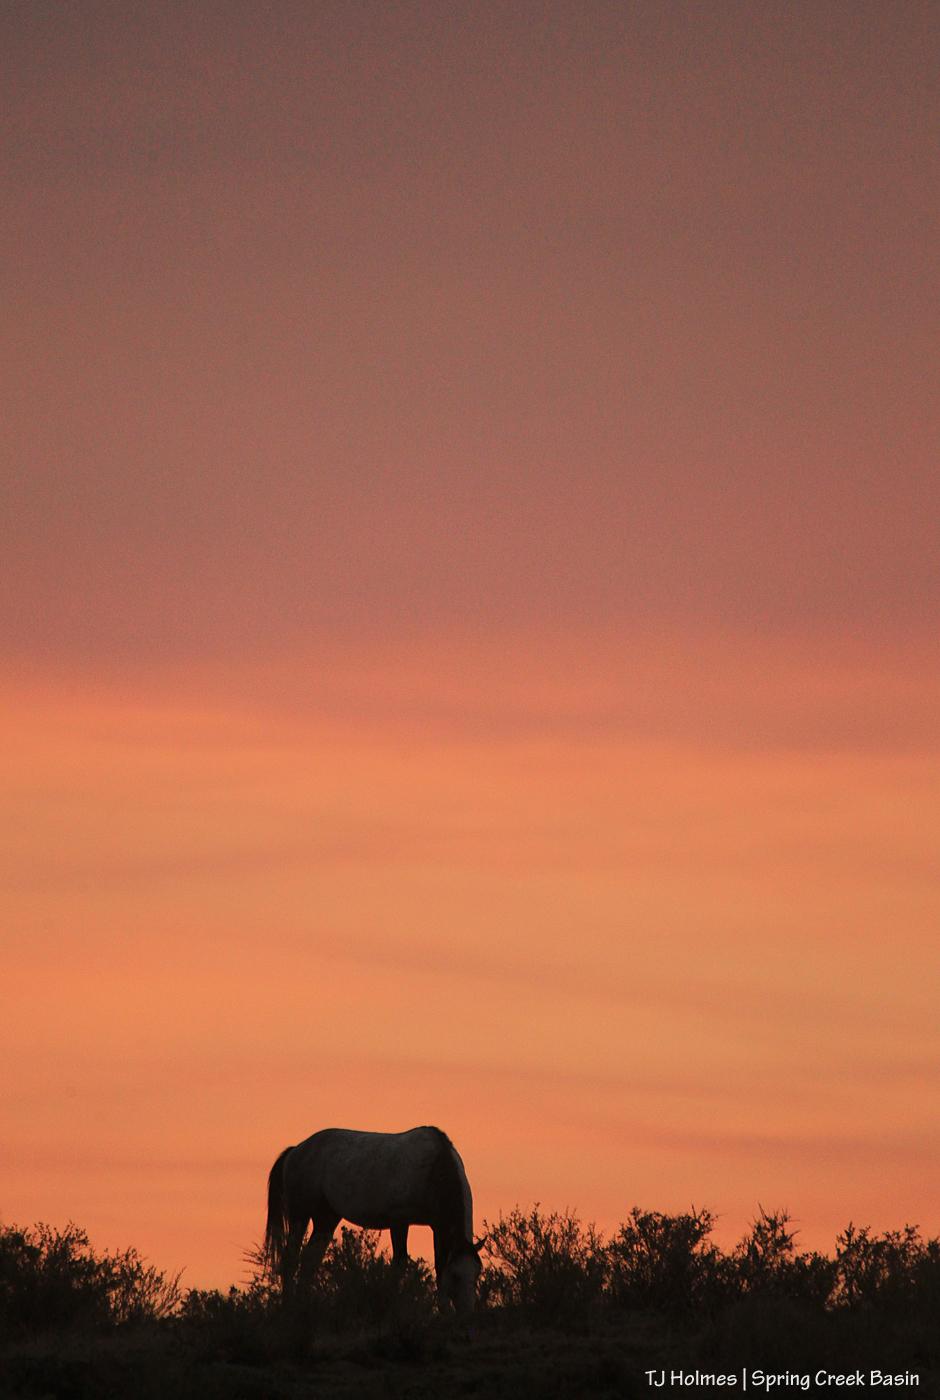 Skywalker, smoky sunset